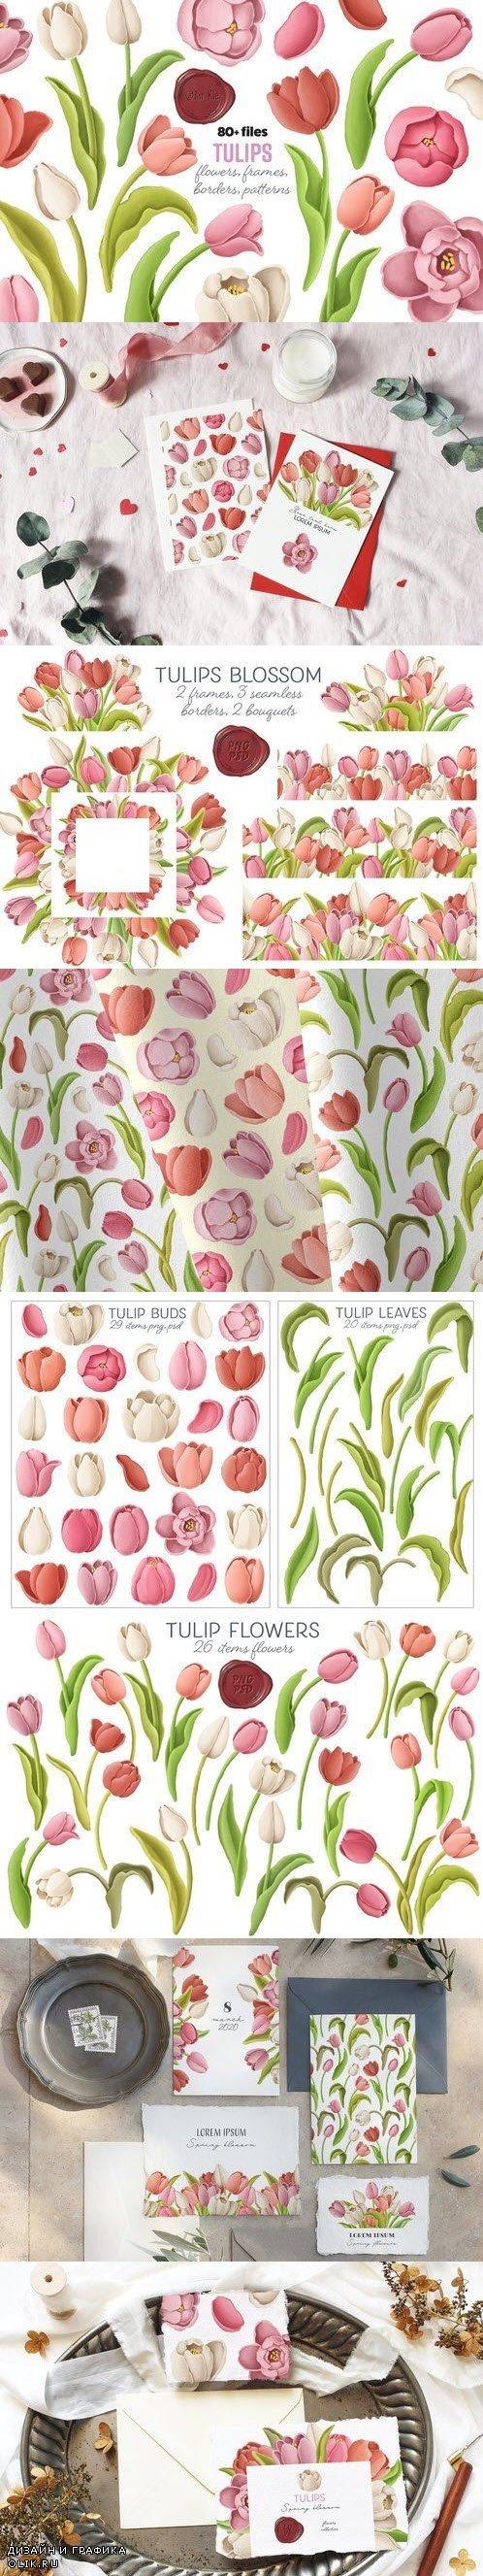 Tulips flowers, patterns, borders - 4440871